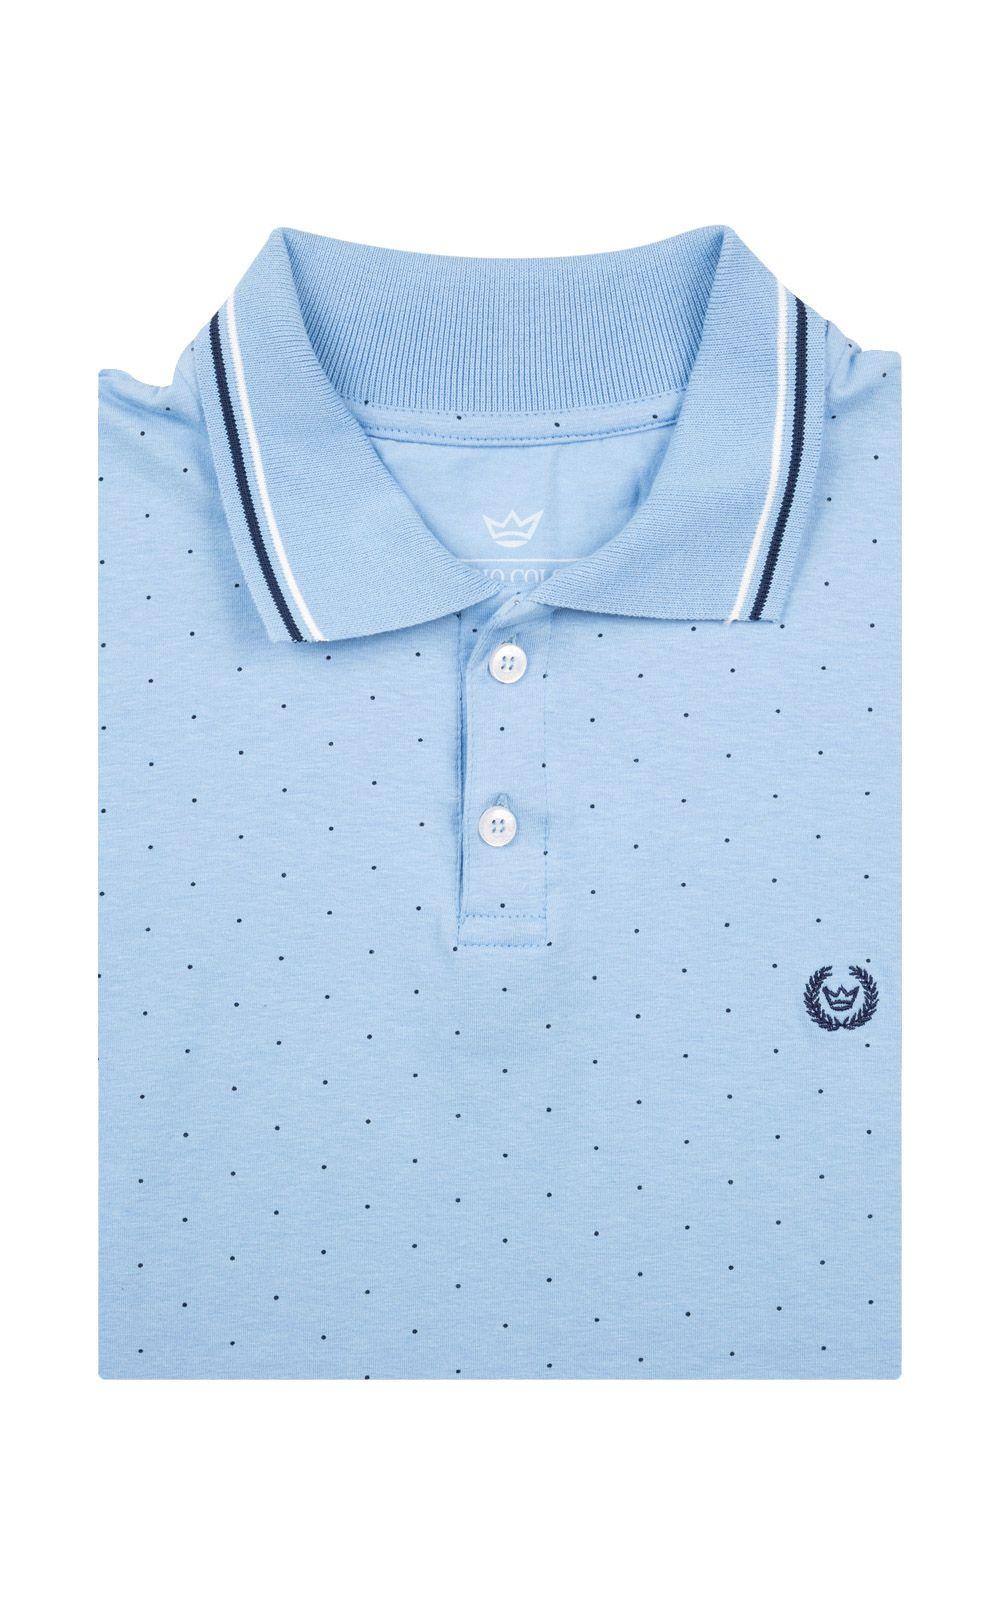 Foto 4 - Camisa Polo Masculina Azul Estampada